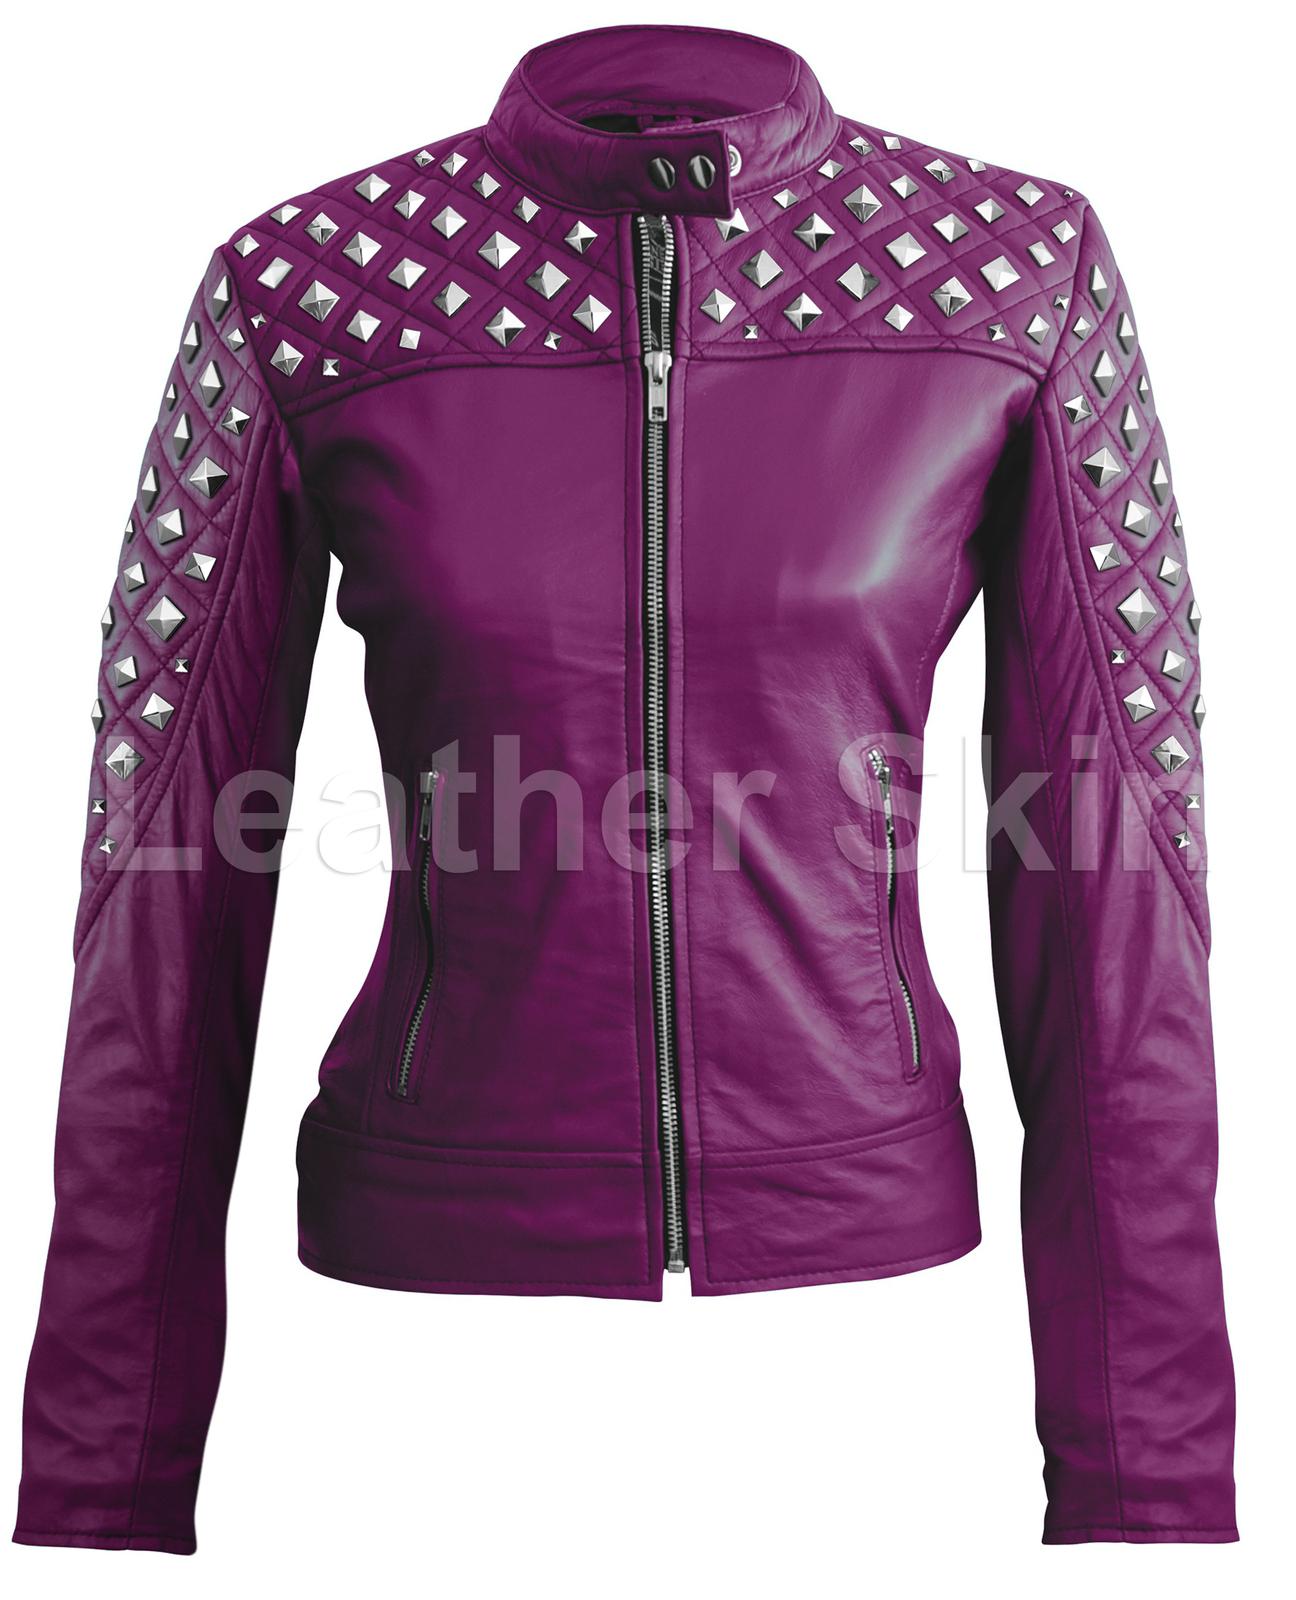 leather skin women purple spike studded studs quilted genuine leather jacket coats jackets. Black Bedroom Furniture Sets. Home Design Ideas